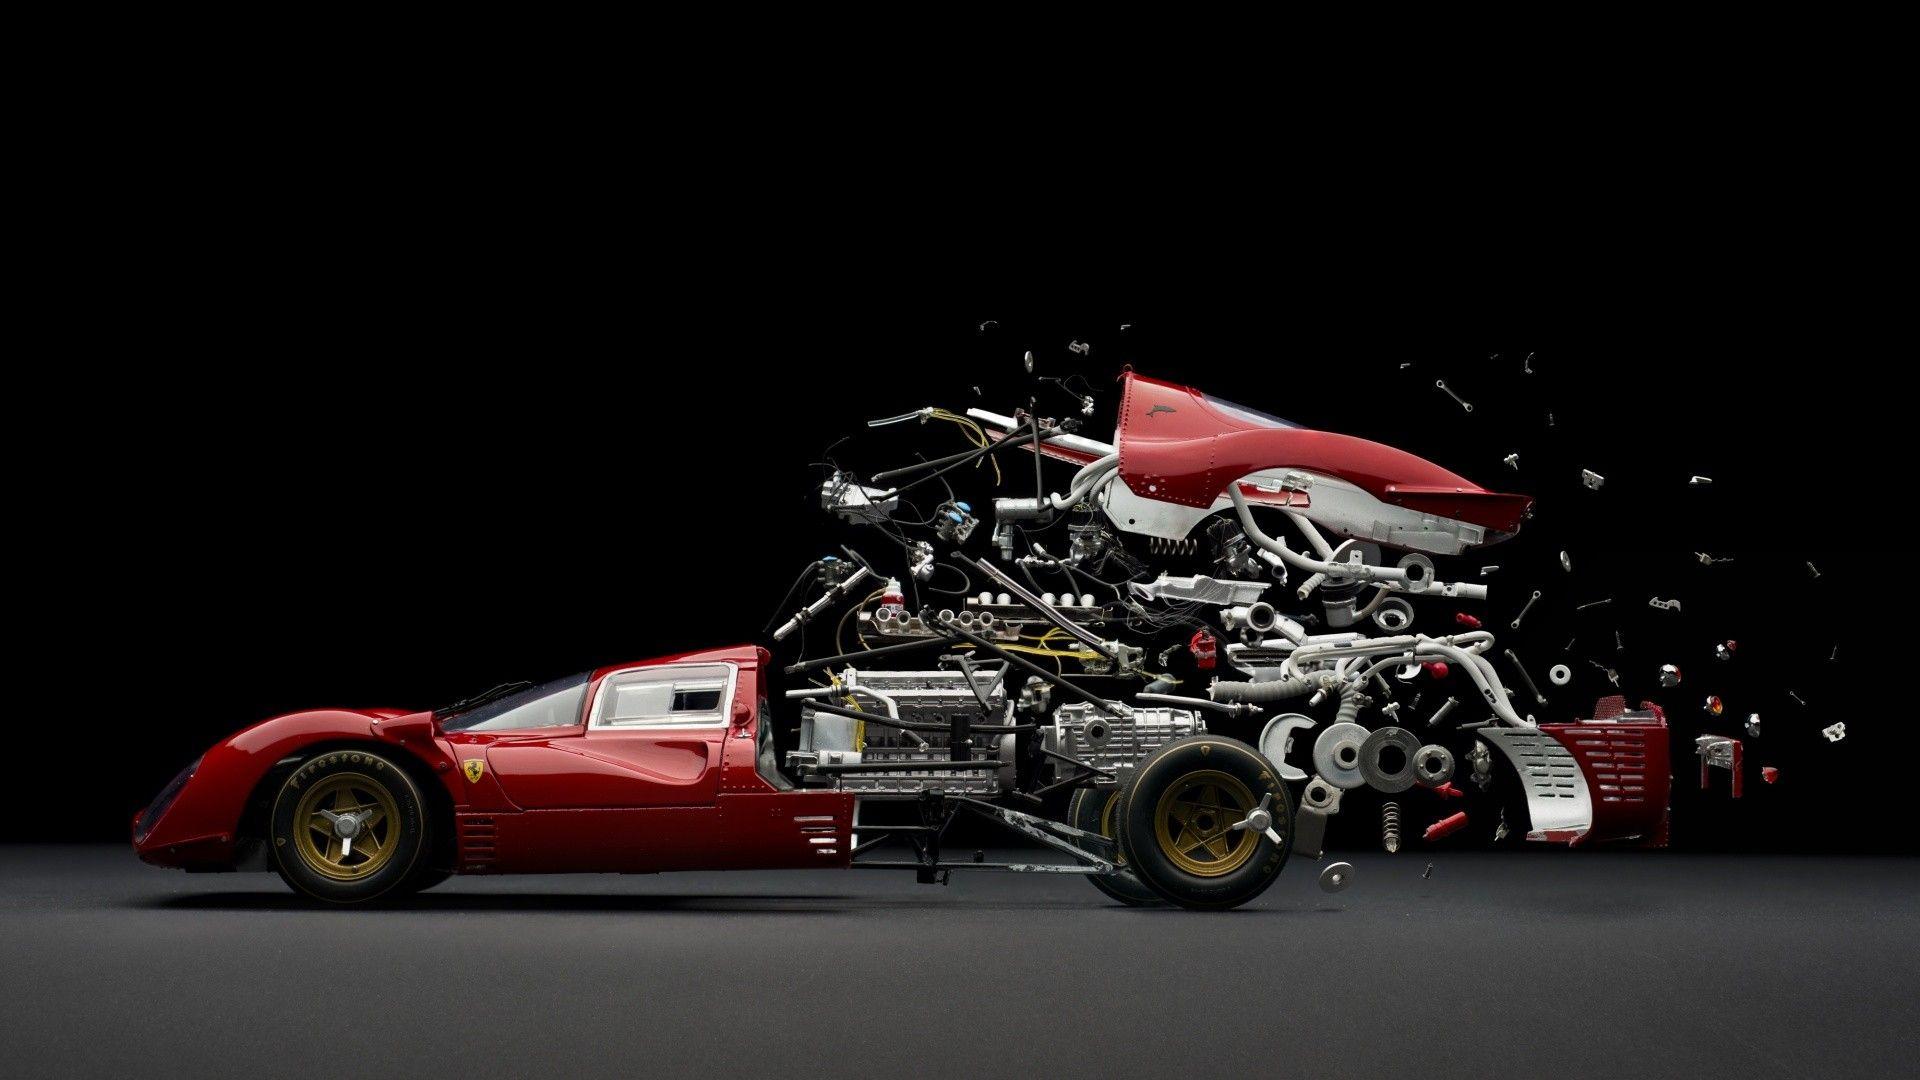 Abstract Car Sports Car Parts Mechanics Ferrari Exploded View Diagram Composite Wallpaper Hd Classic Sports Cars Car Model Dream Cars